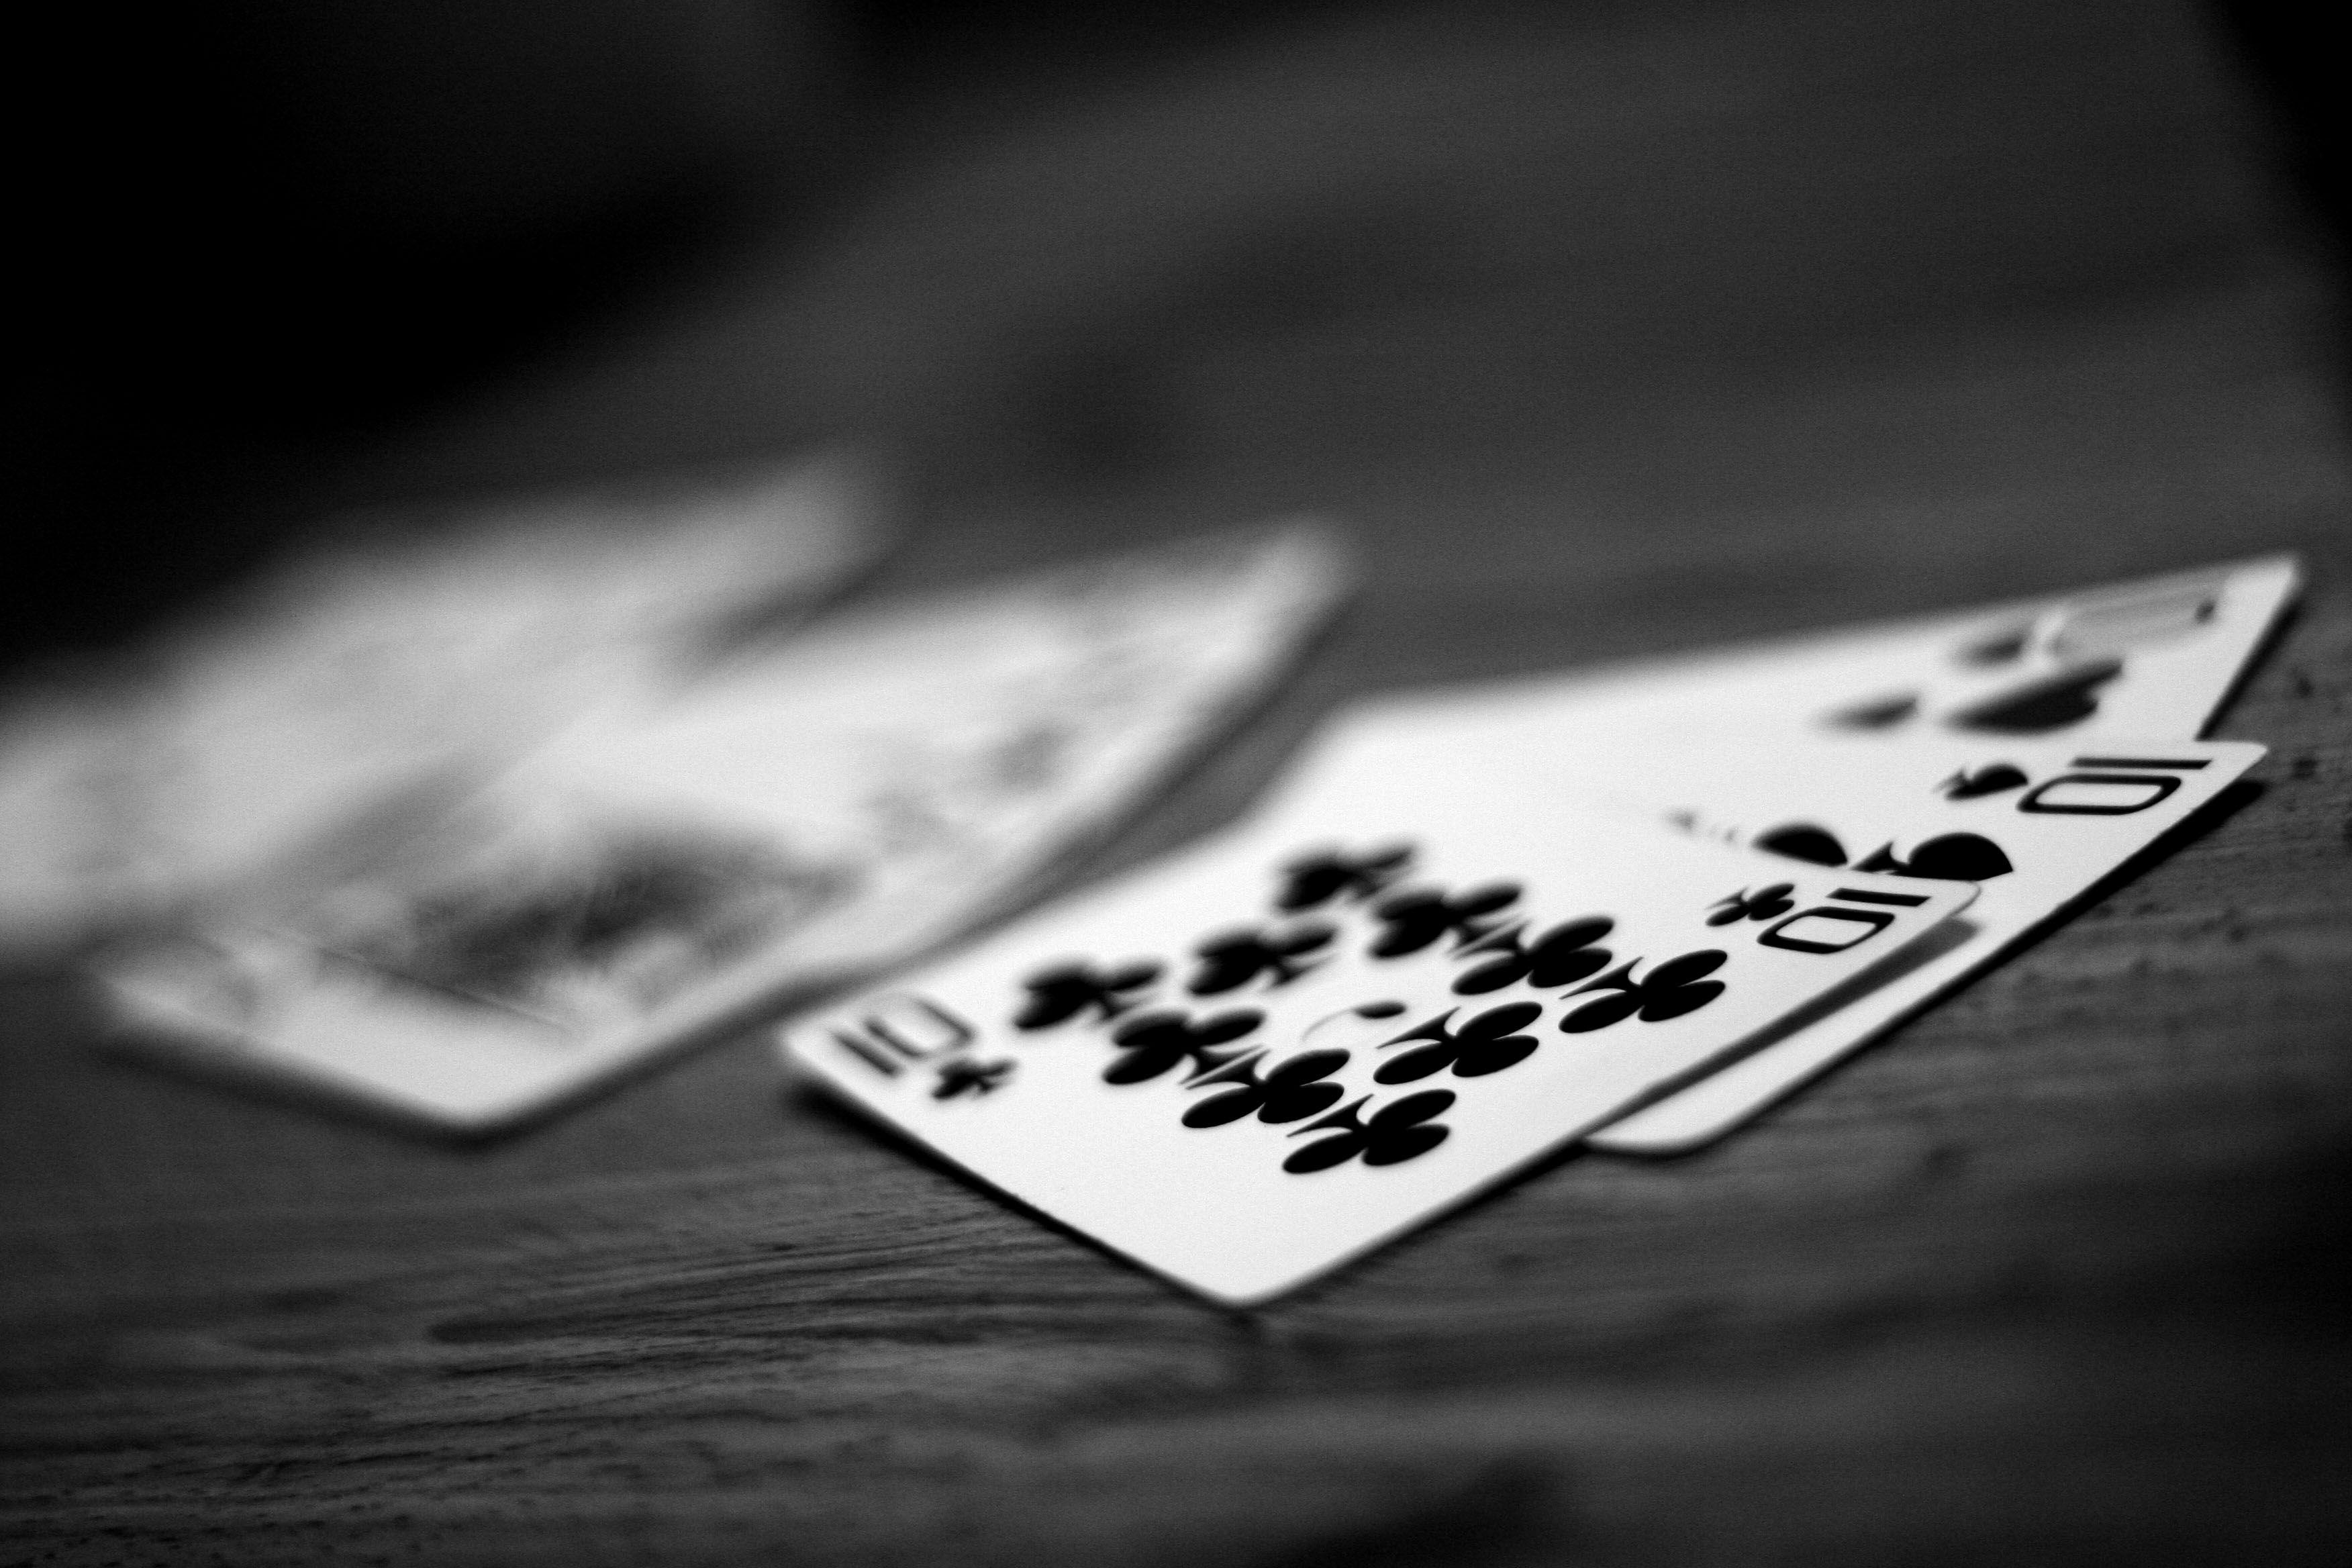 001 Belote cartes jeuxdecartes Poker, Playing cards